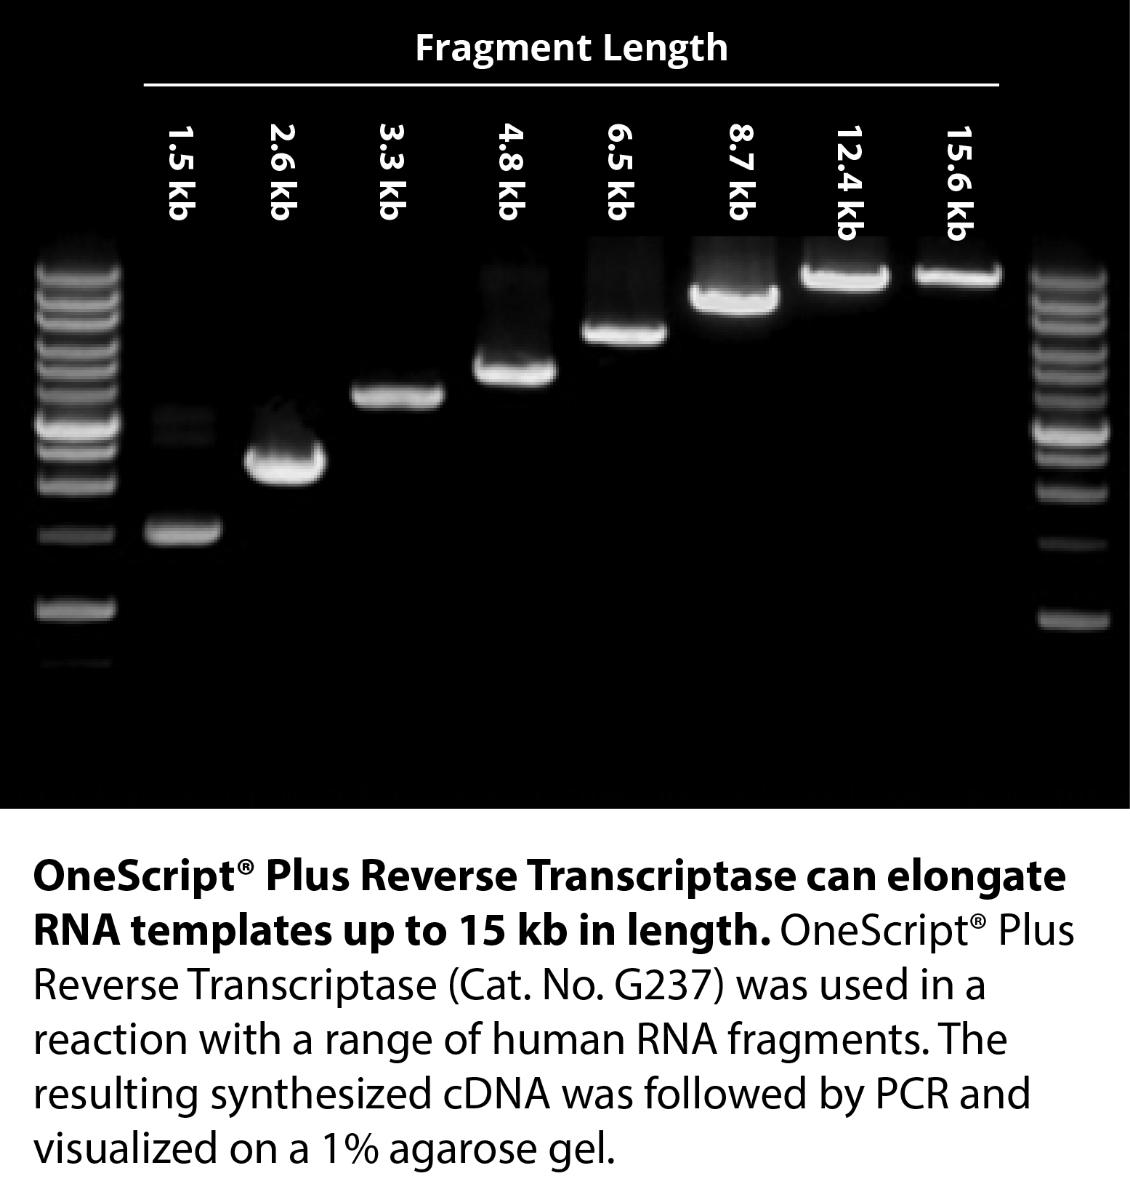 OneScript® Plus Reverse Transcriptase